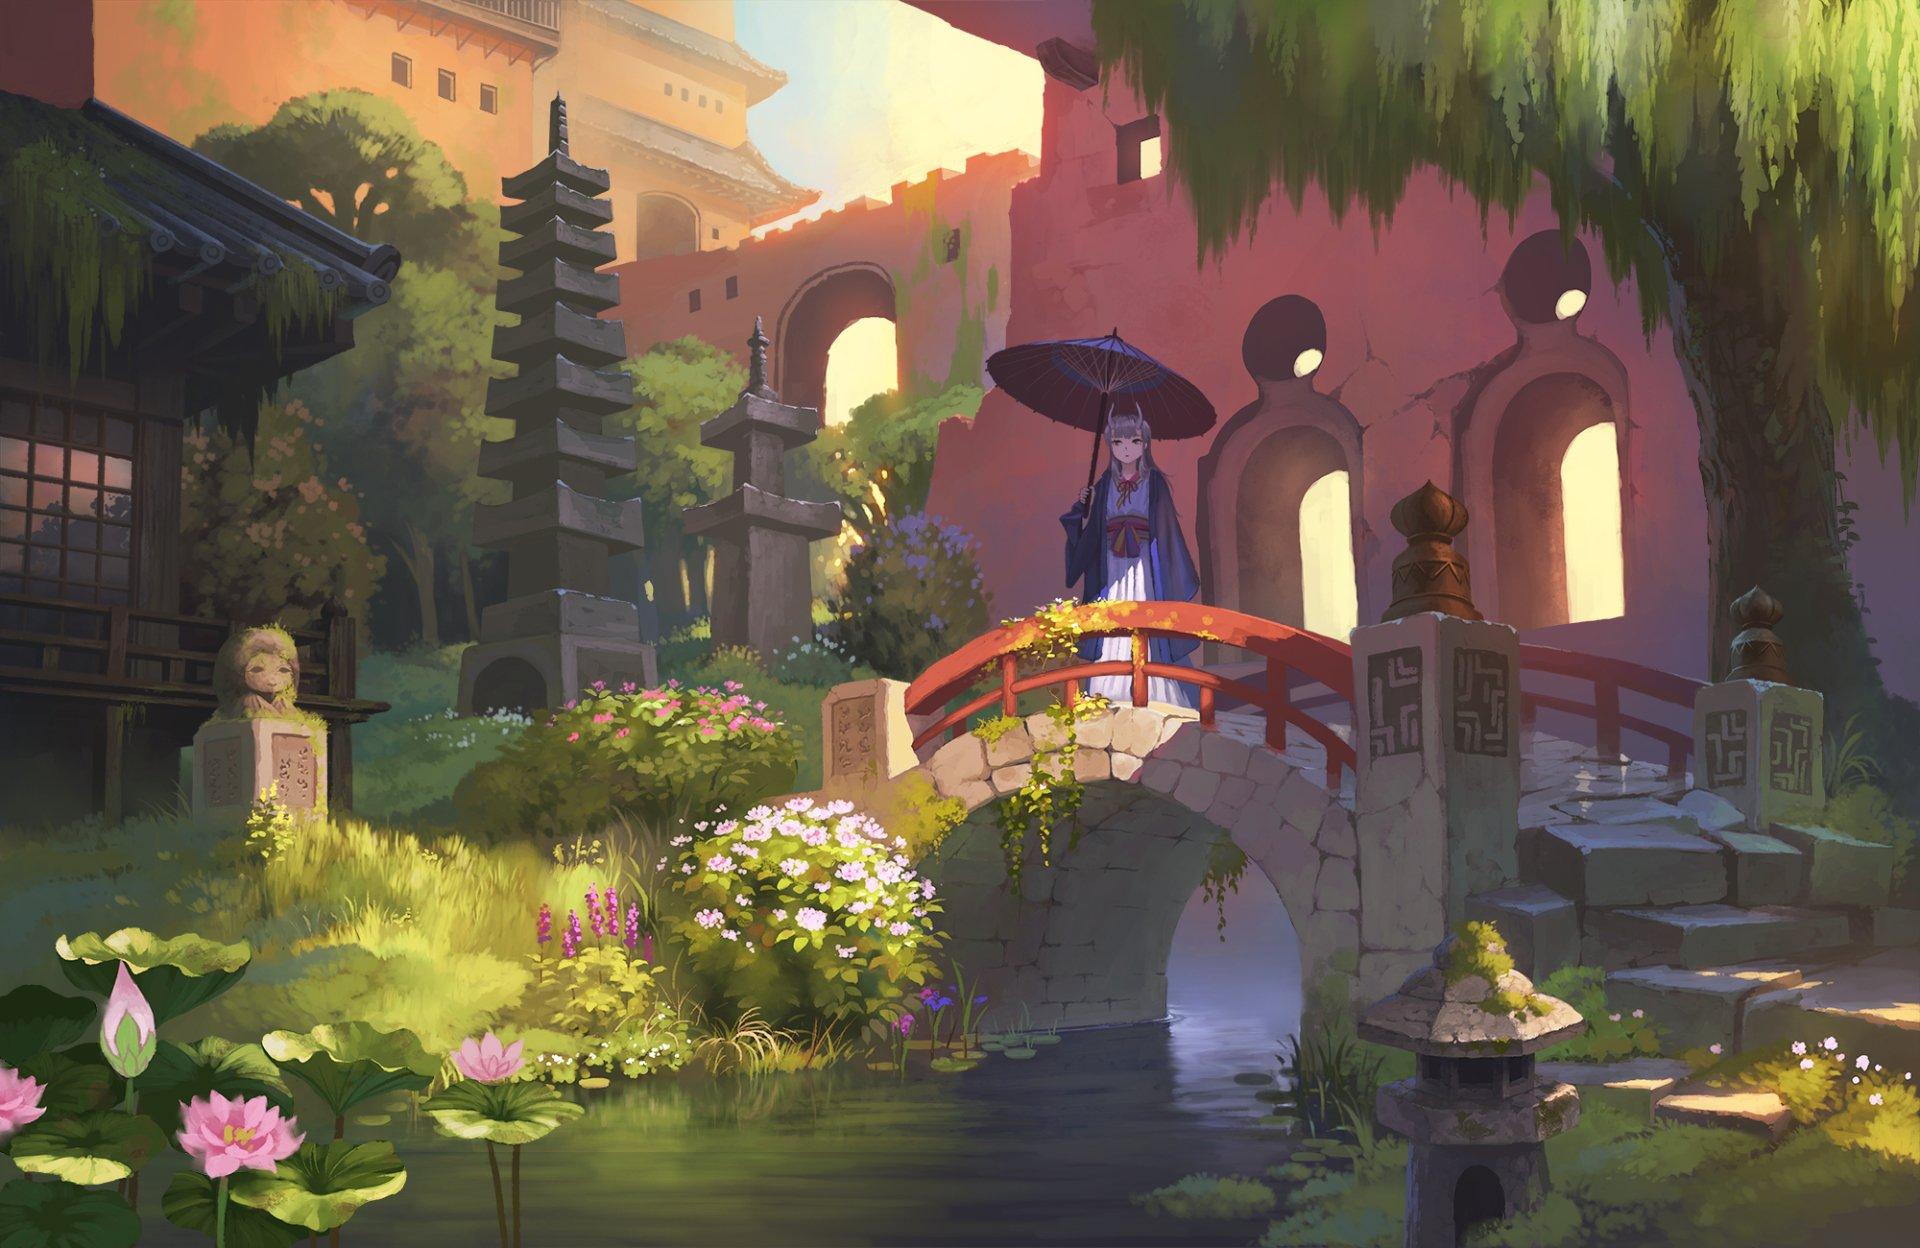 Anime - Original  Flower Umbrella Horns Park Girl Oriental Bridge Wallpaper